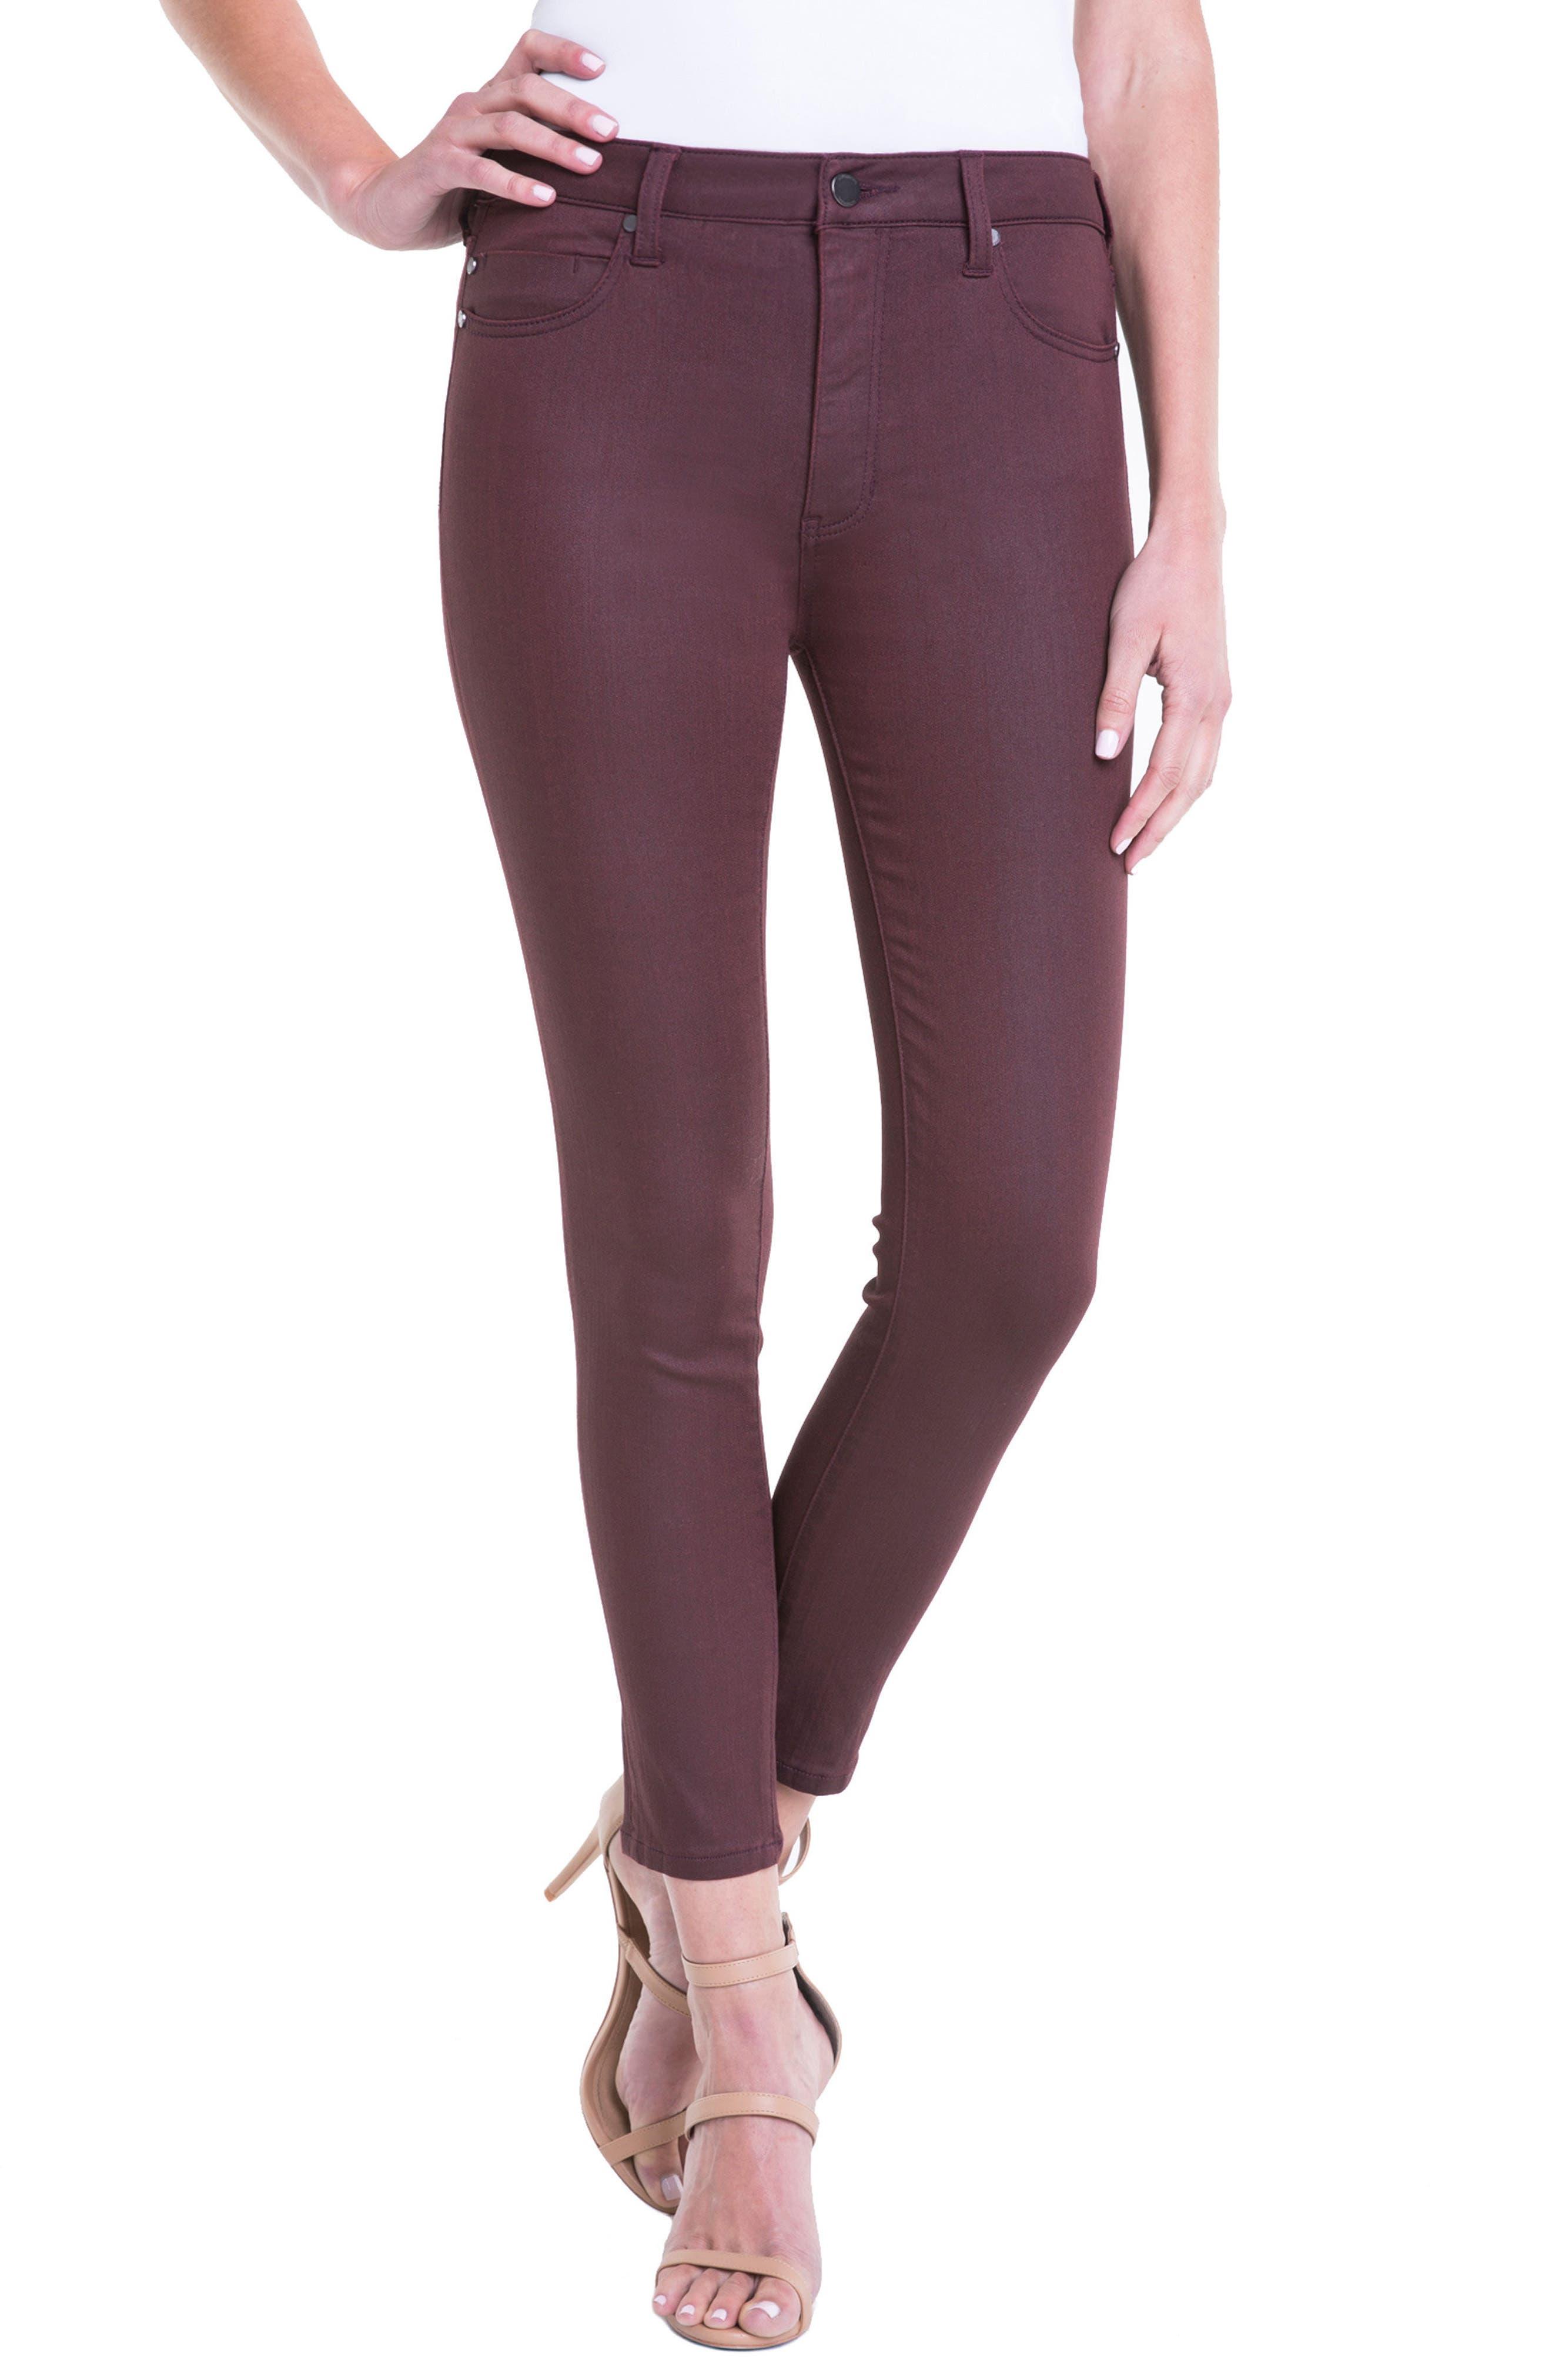 Liverpool Jeans Company Bridget Coated High Waist Skinny Jeans